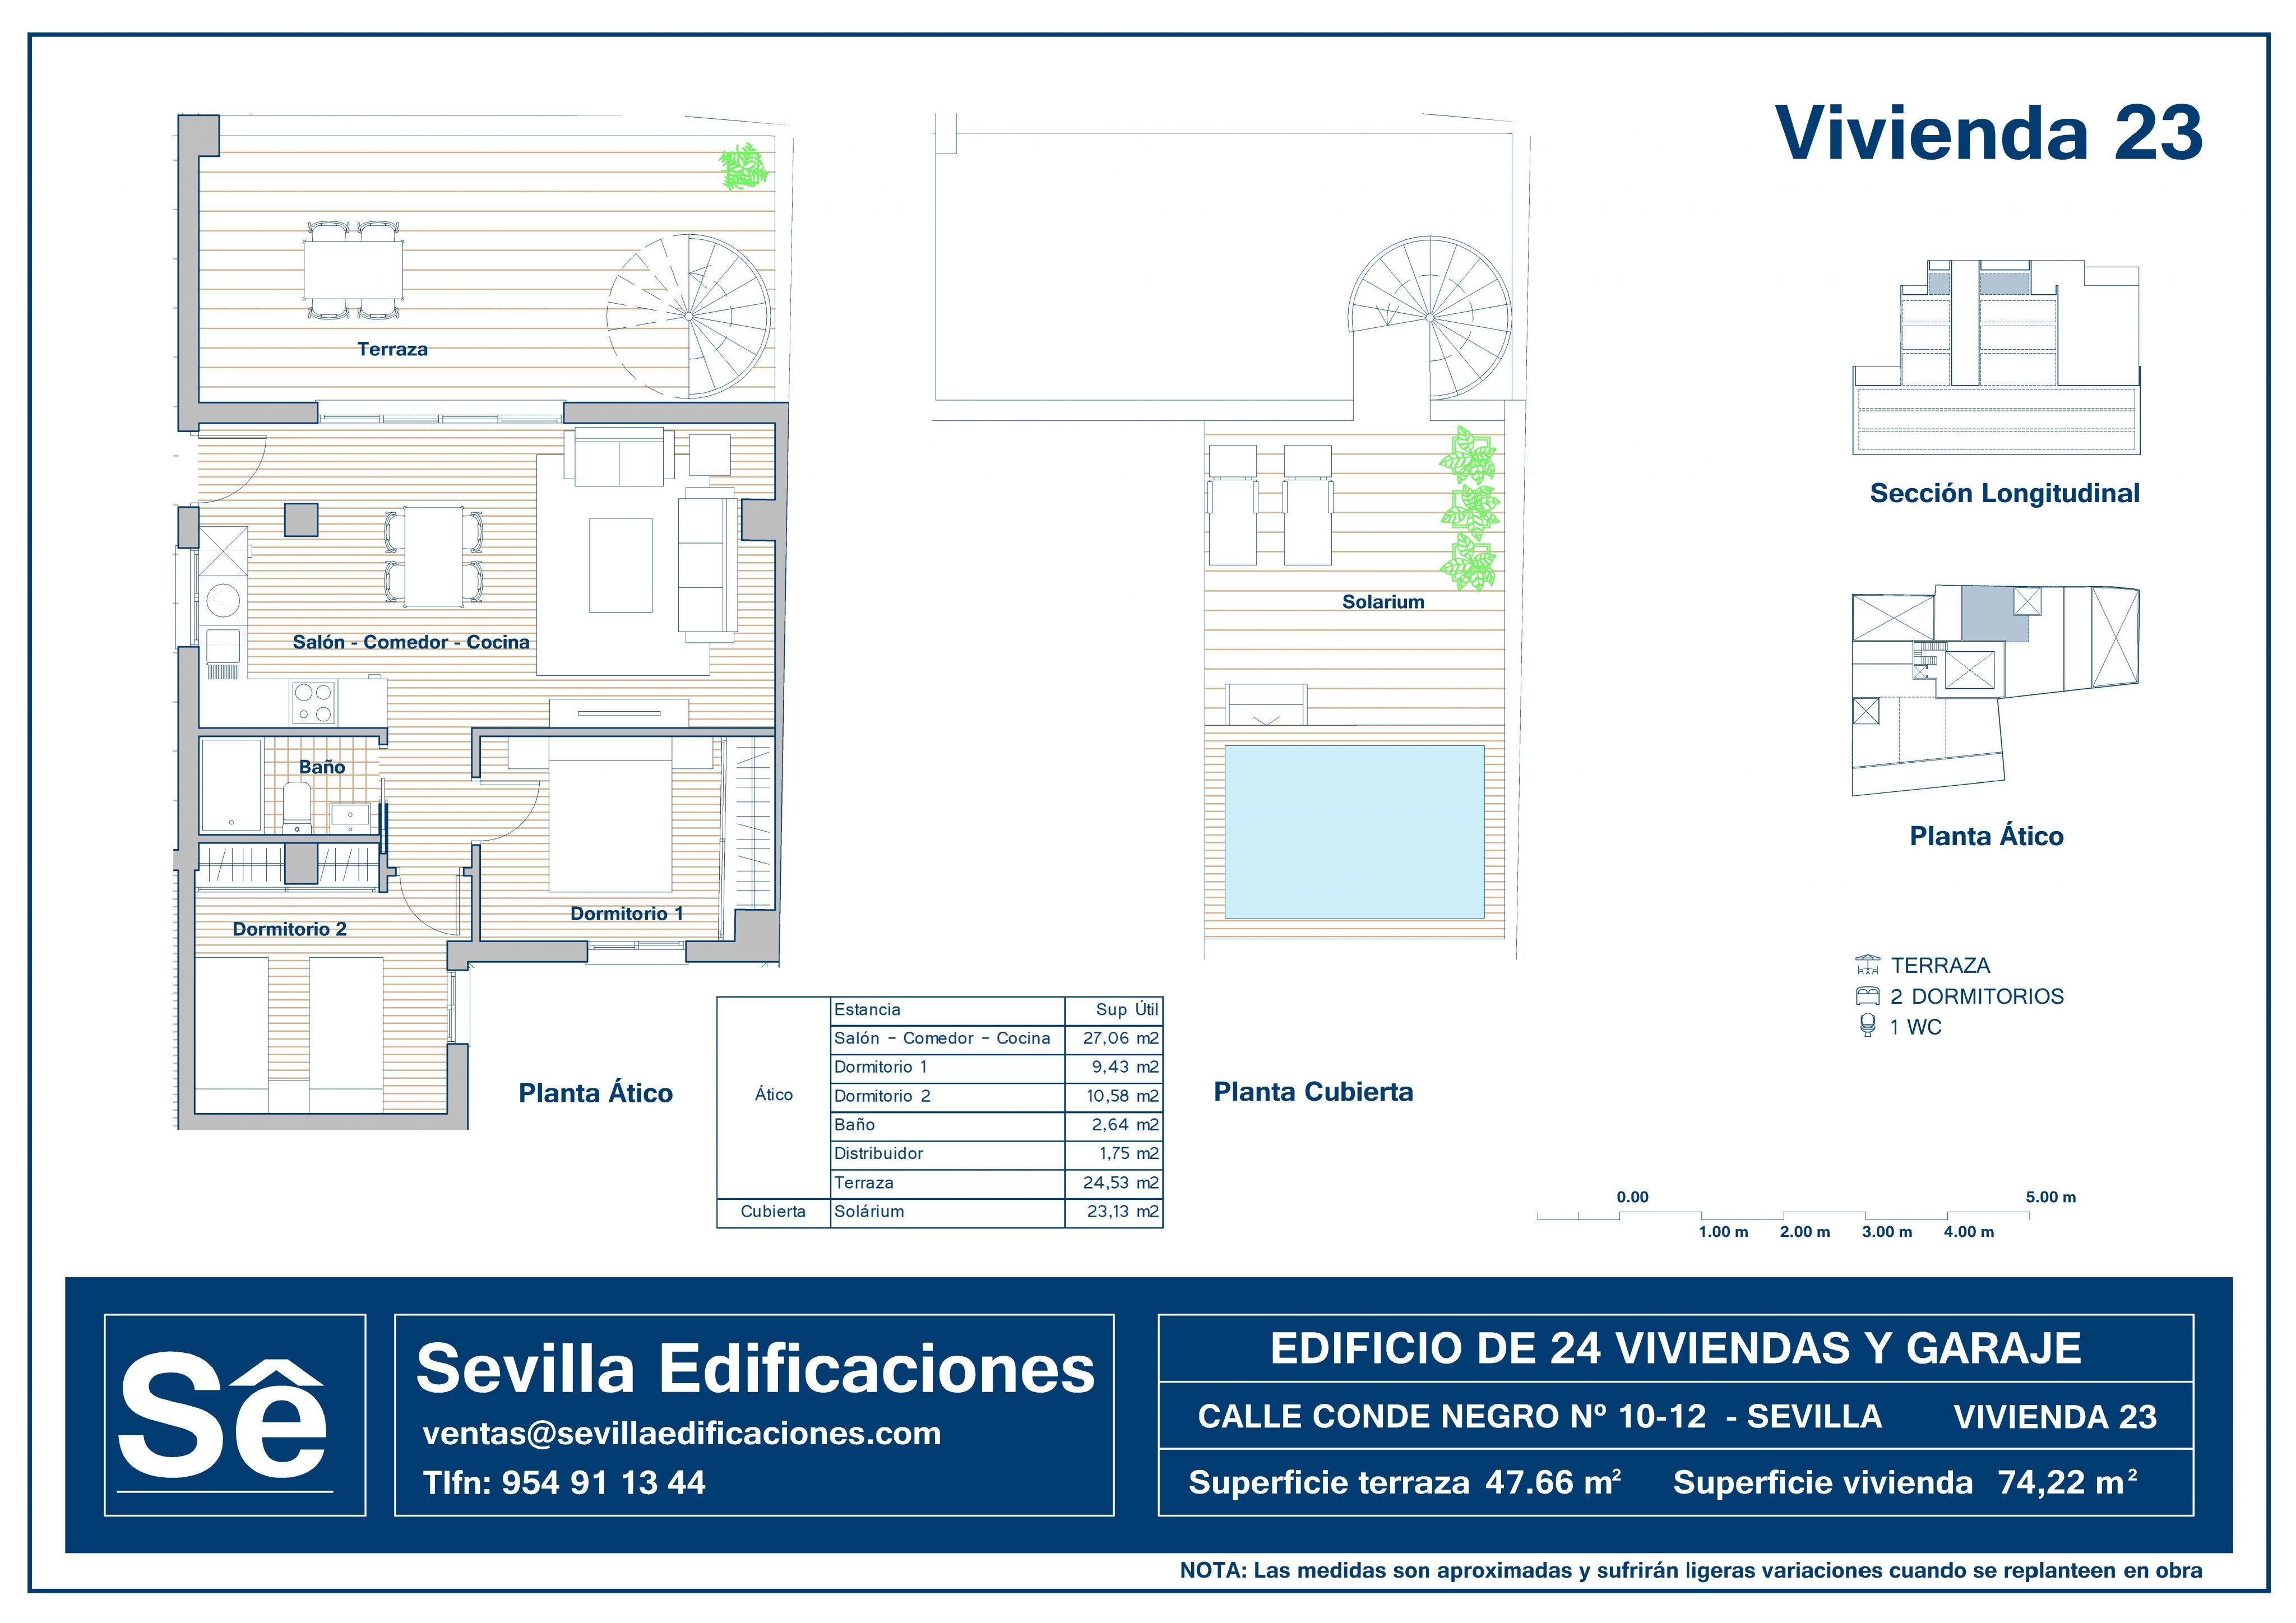 CONDENEGRO_VIVIENDA_23